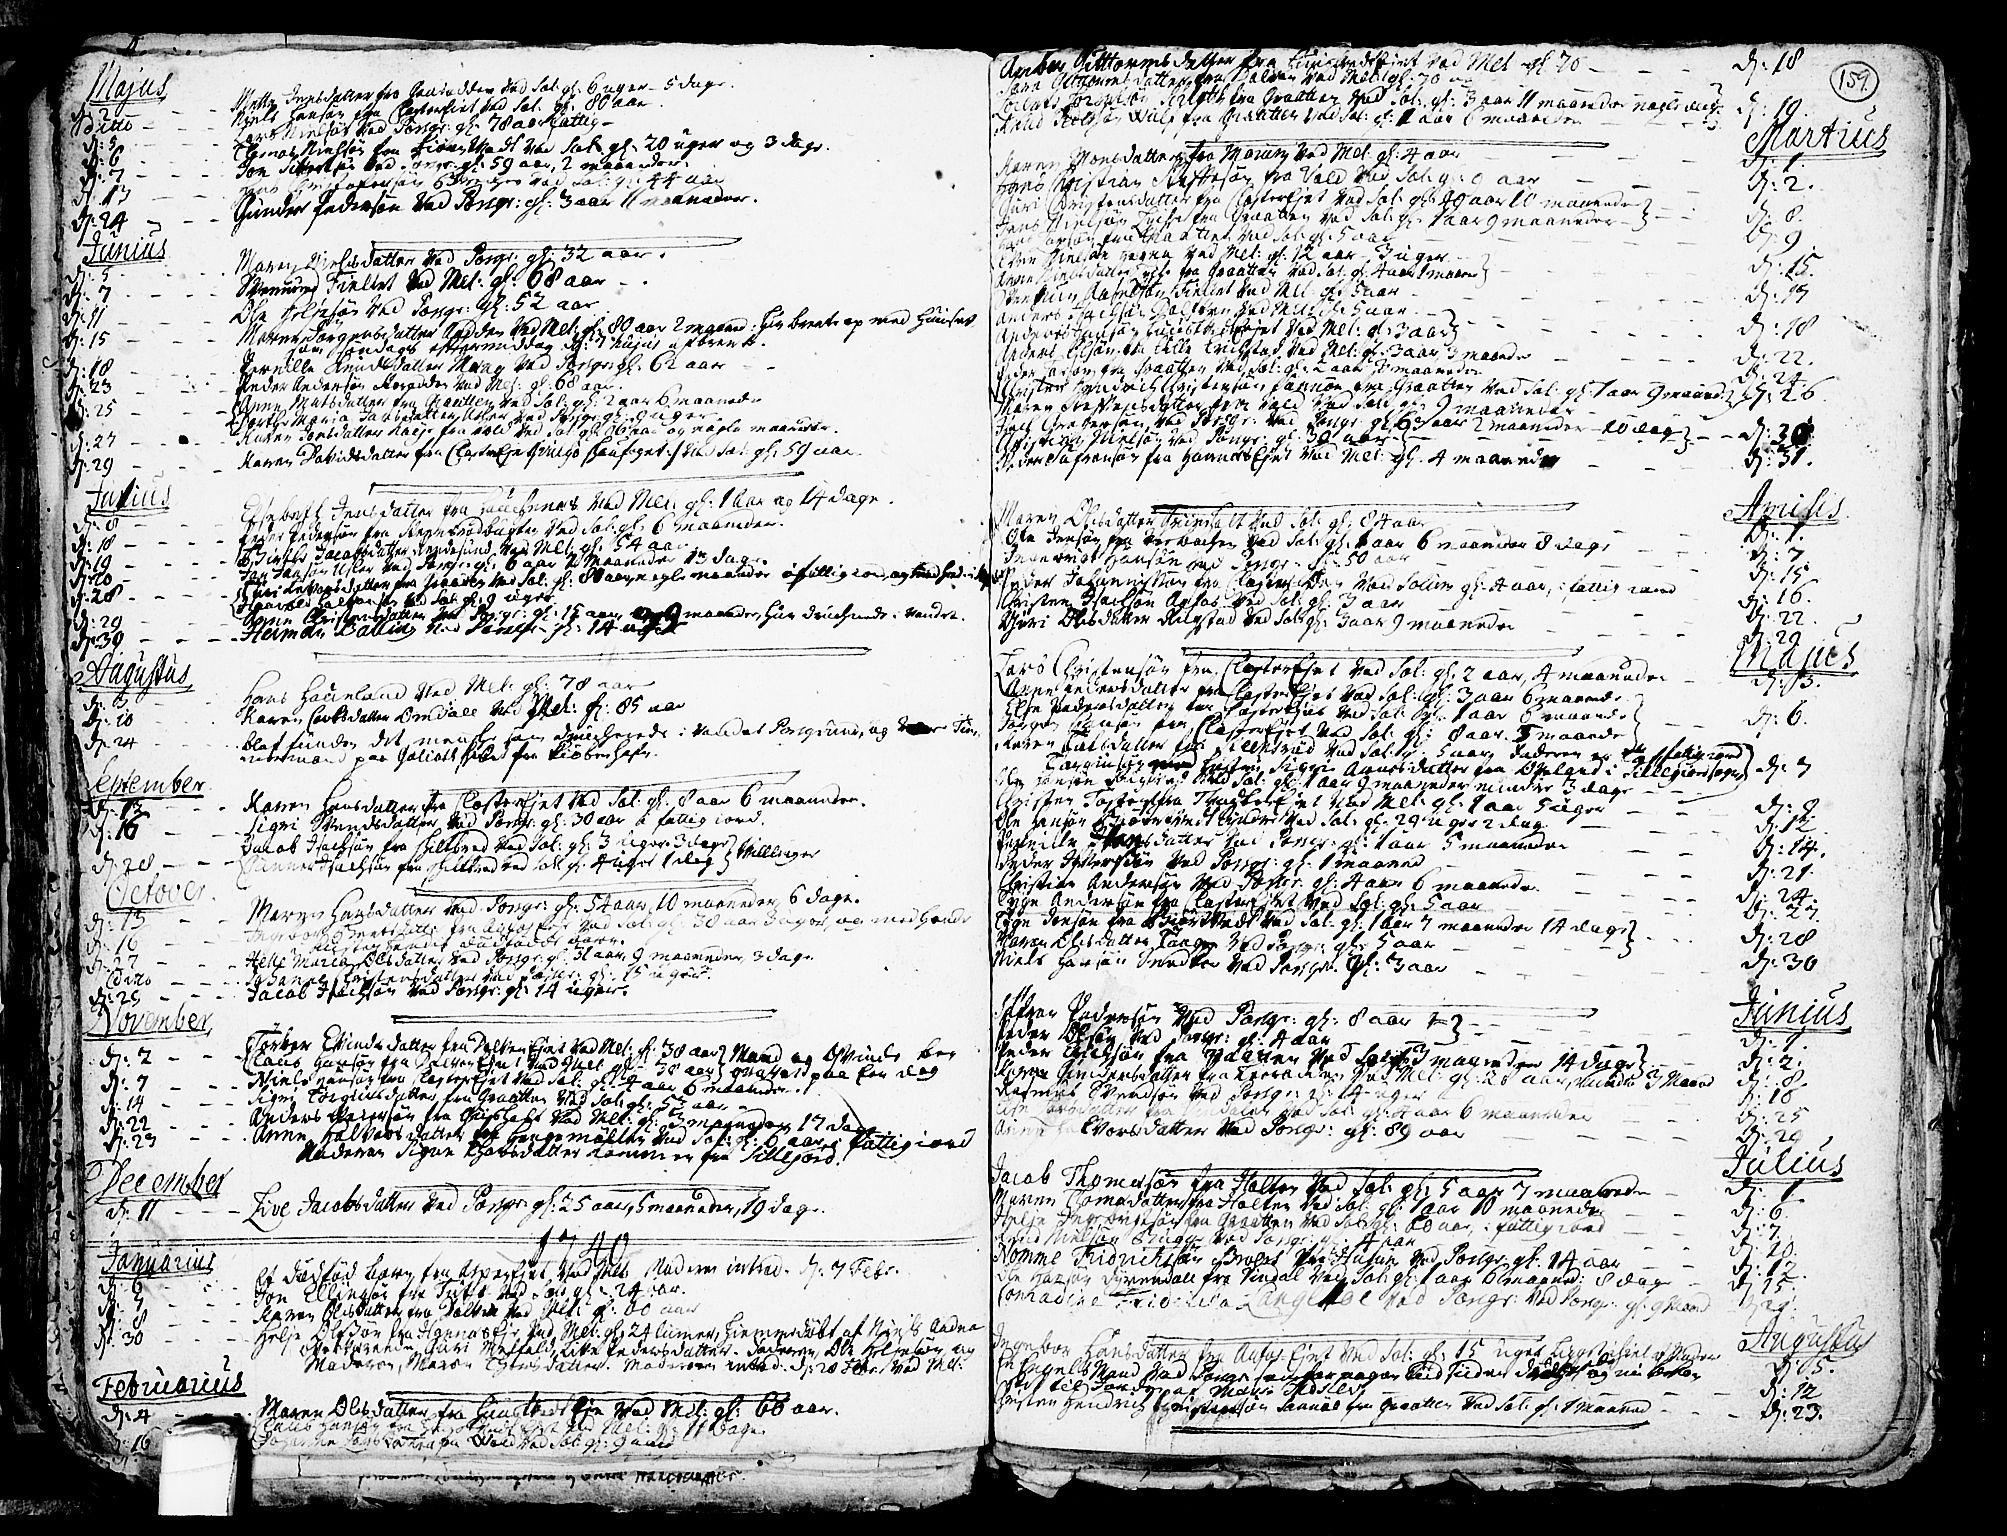 SAKO, Solum kirkebøker, F/Fa/L0002: Ministerialbok nr. I 2, 1713-1761, s. 159